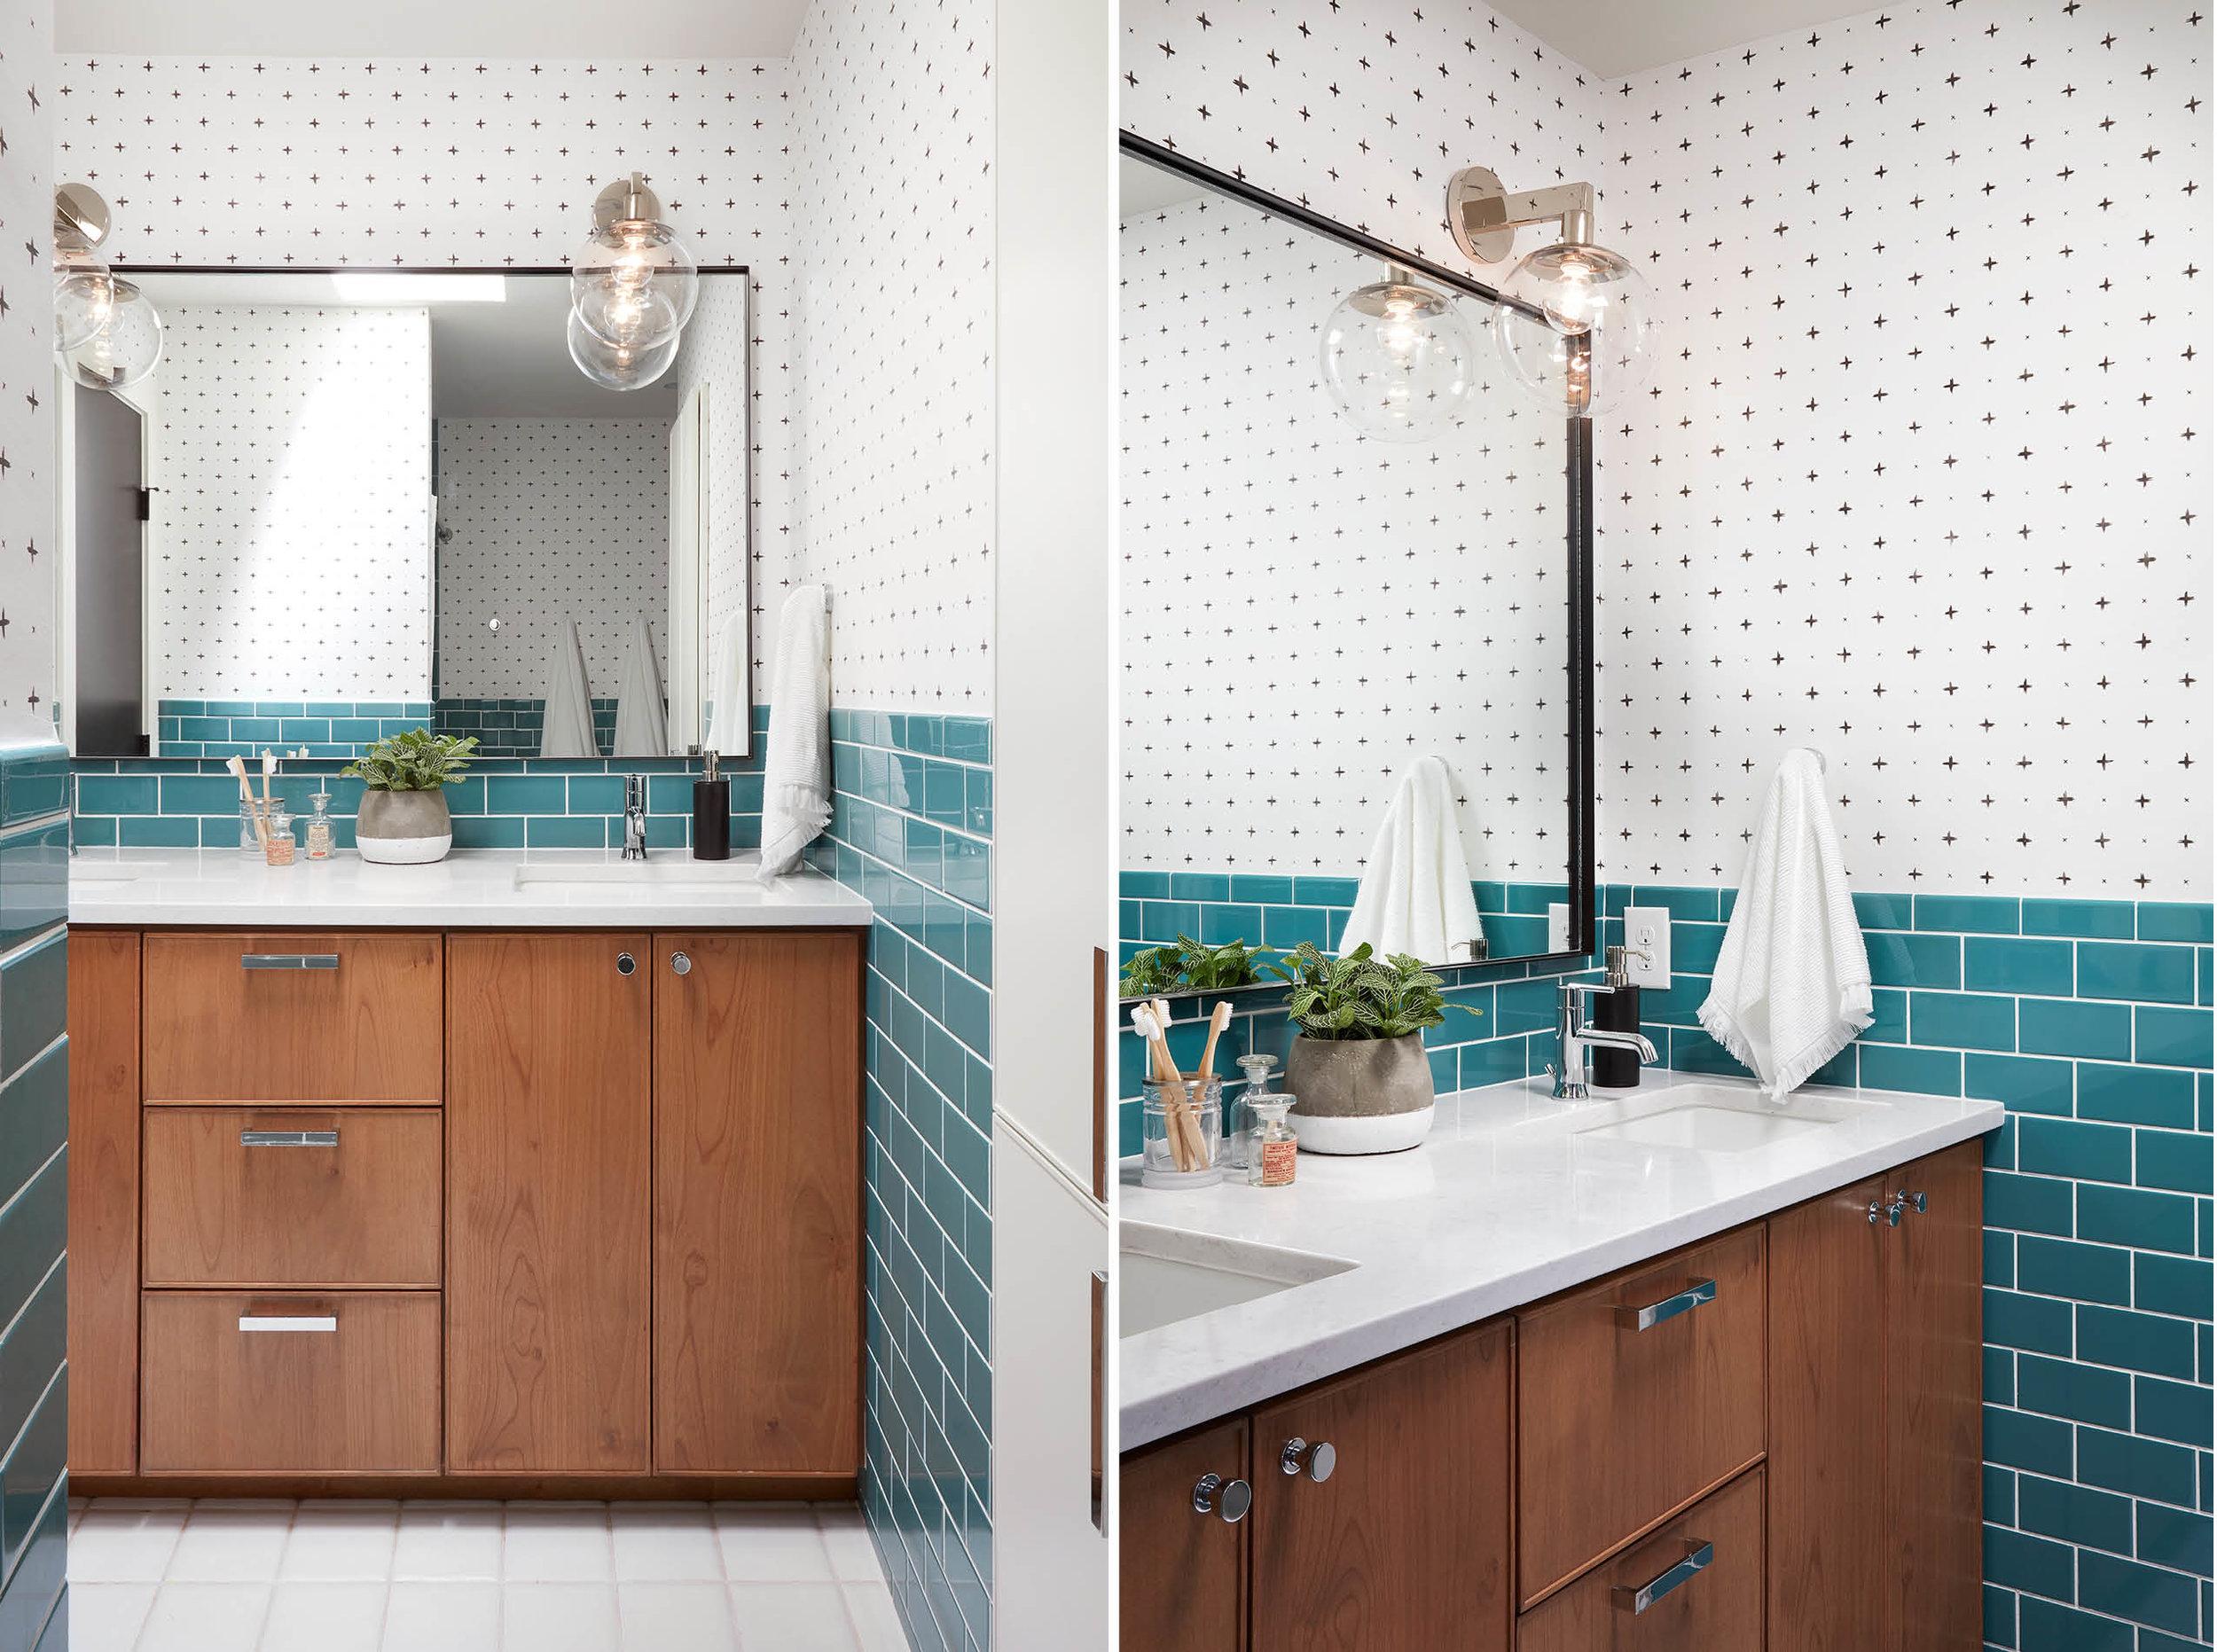 (Magnolia Home Artful Prints + Patterns—Cross Stitch MK1100)